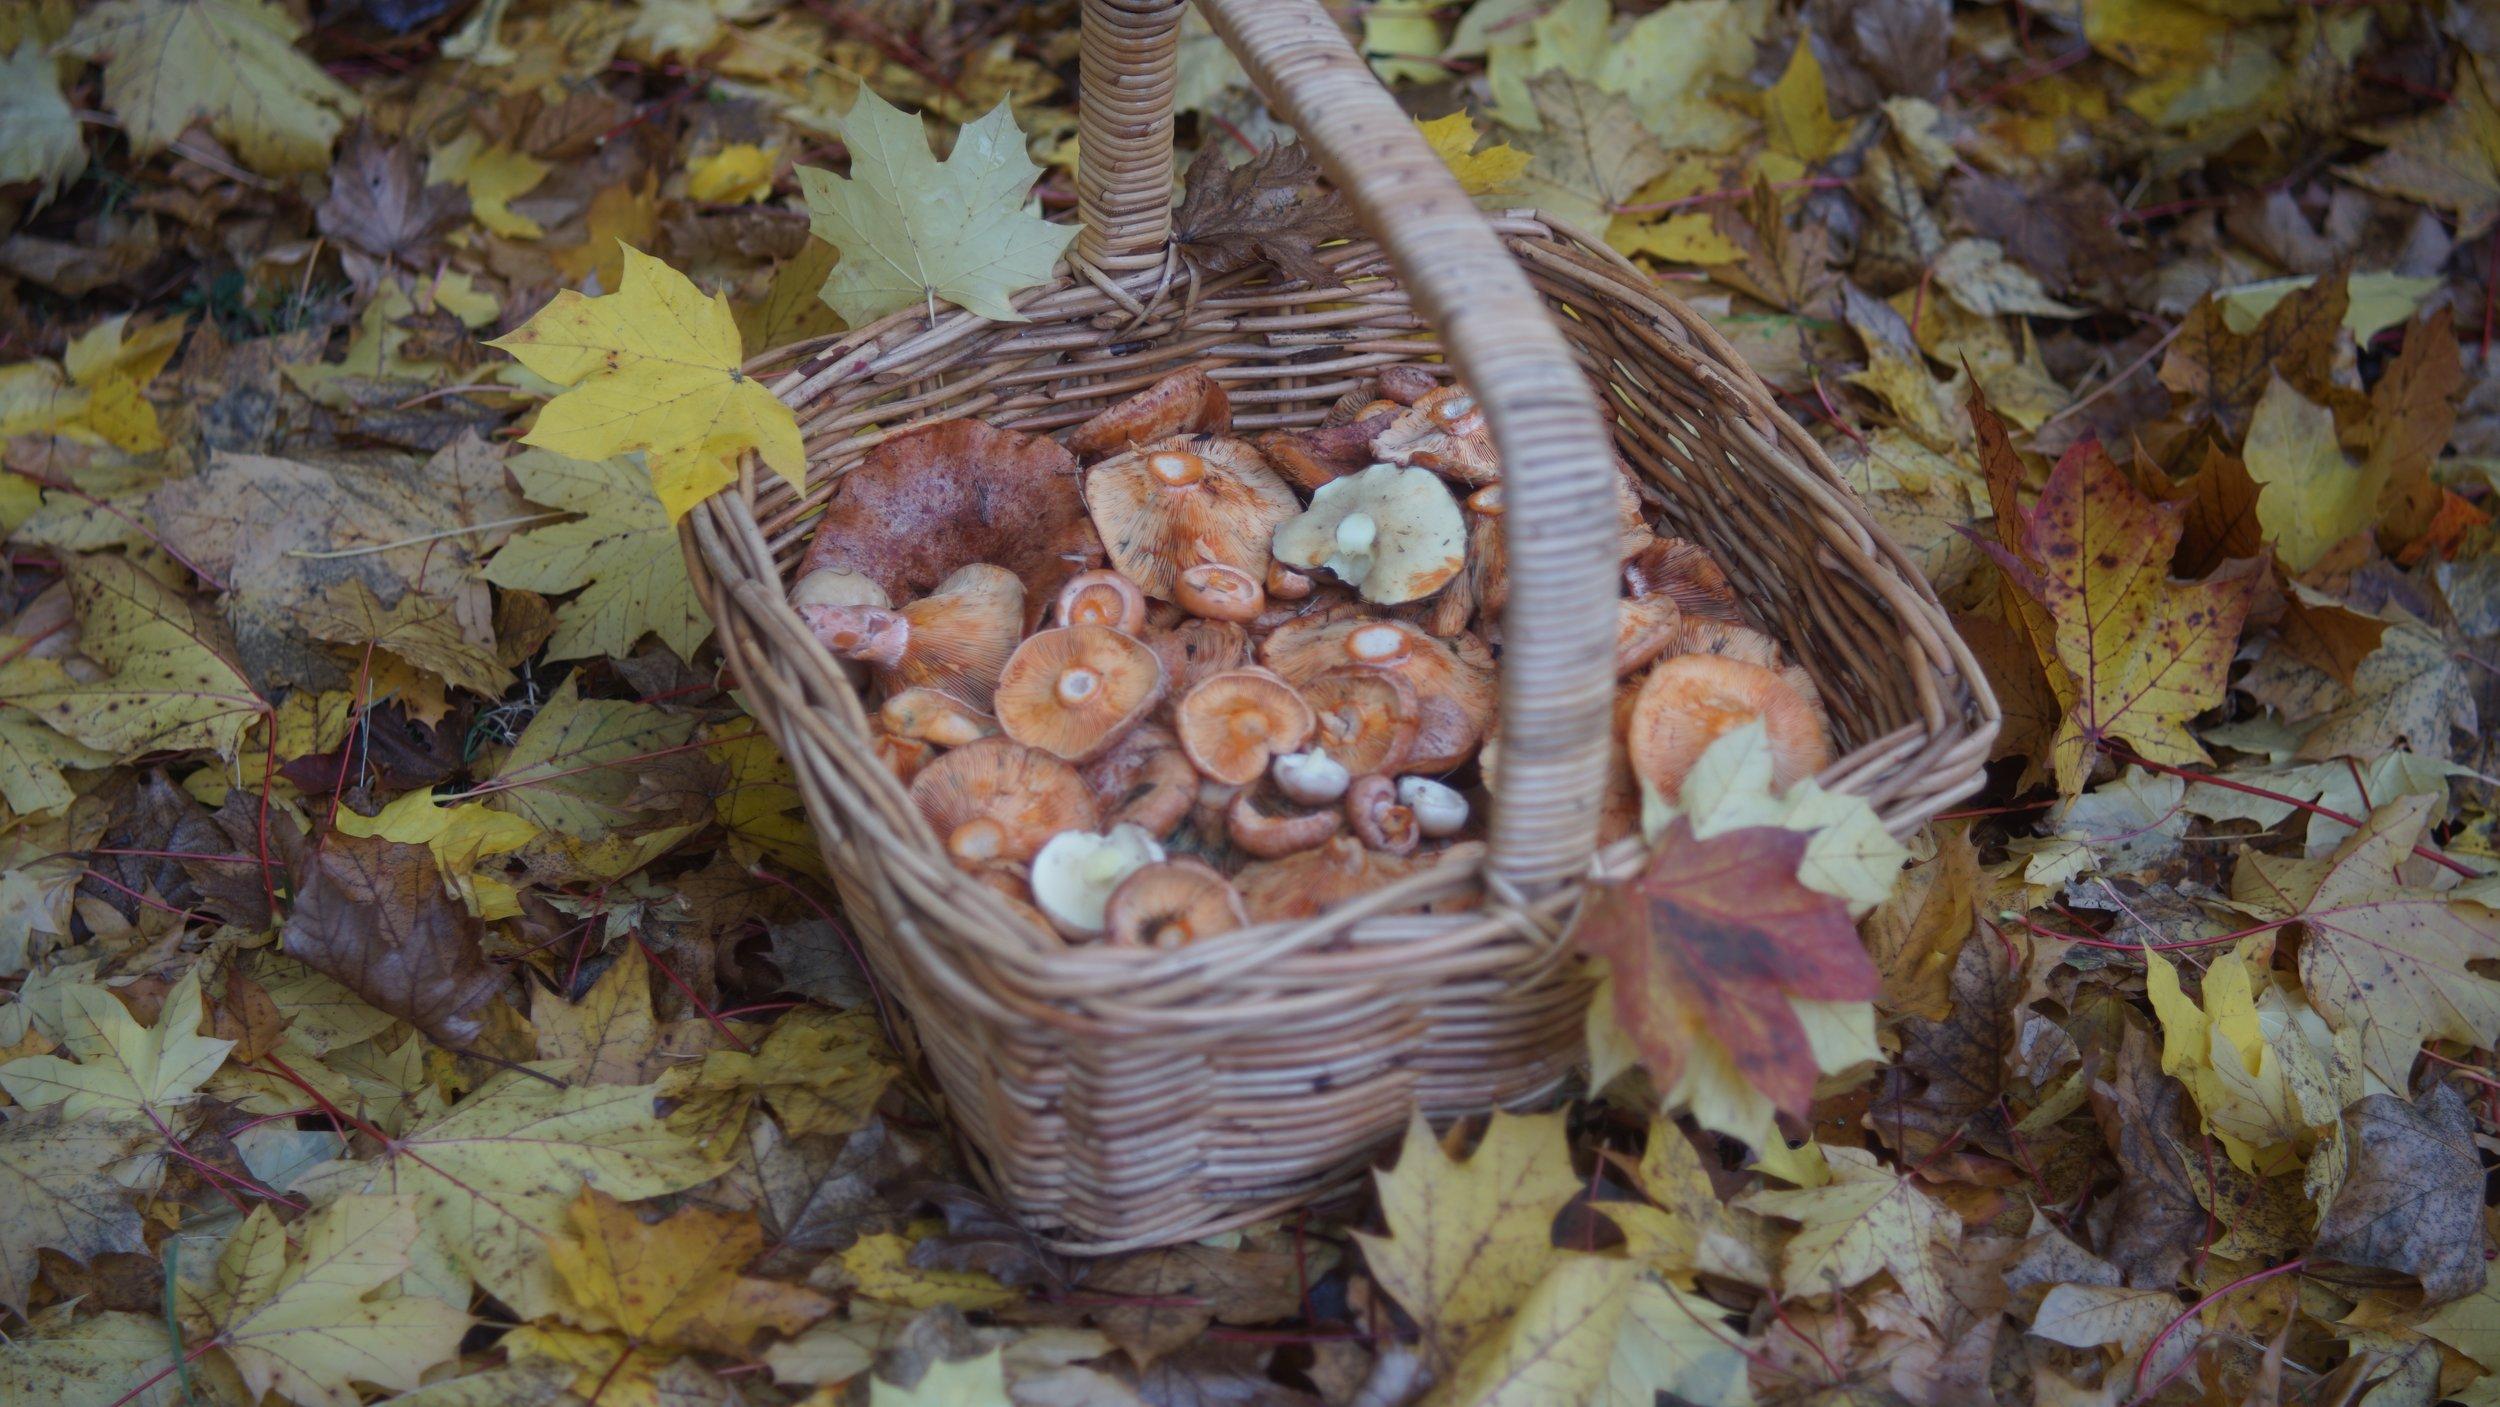 A basket full of pine mushrooms